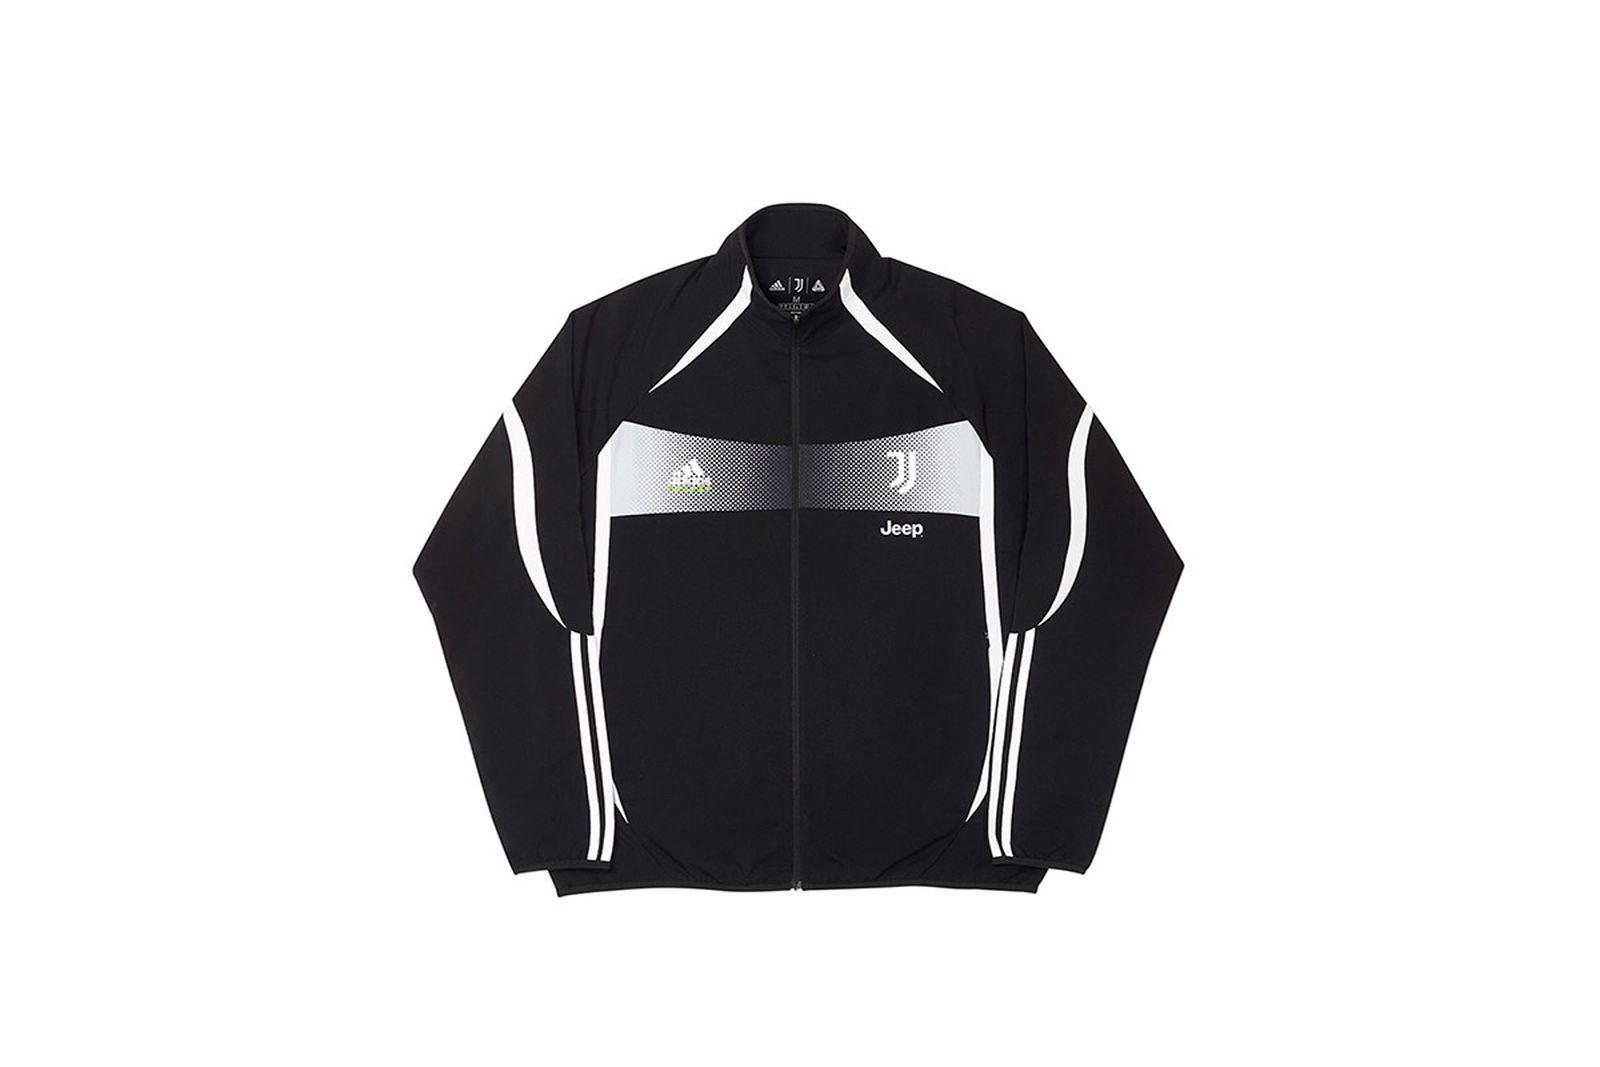 Palace-2019-Adidas-Juventus-Training-Top-zip-black-19581